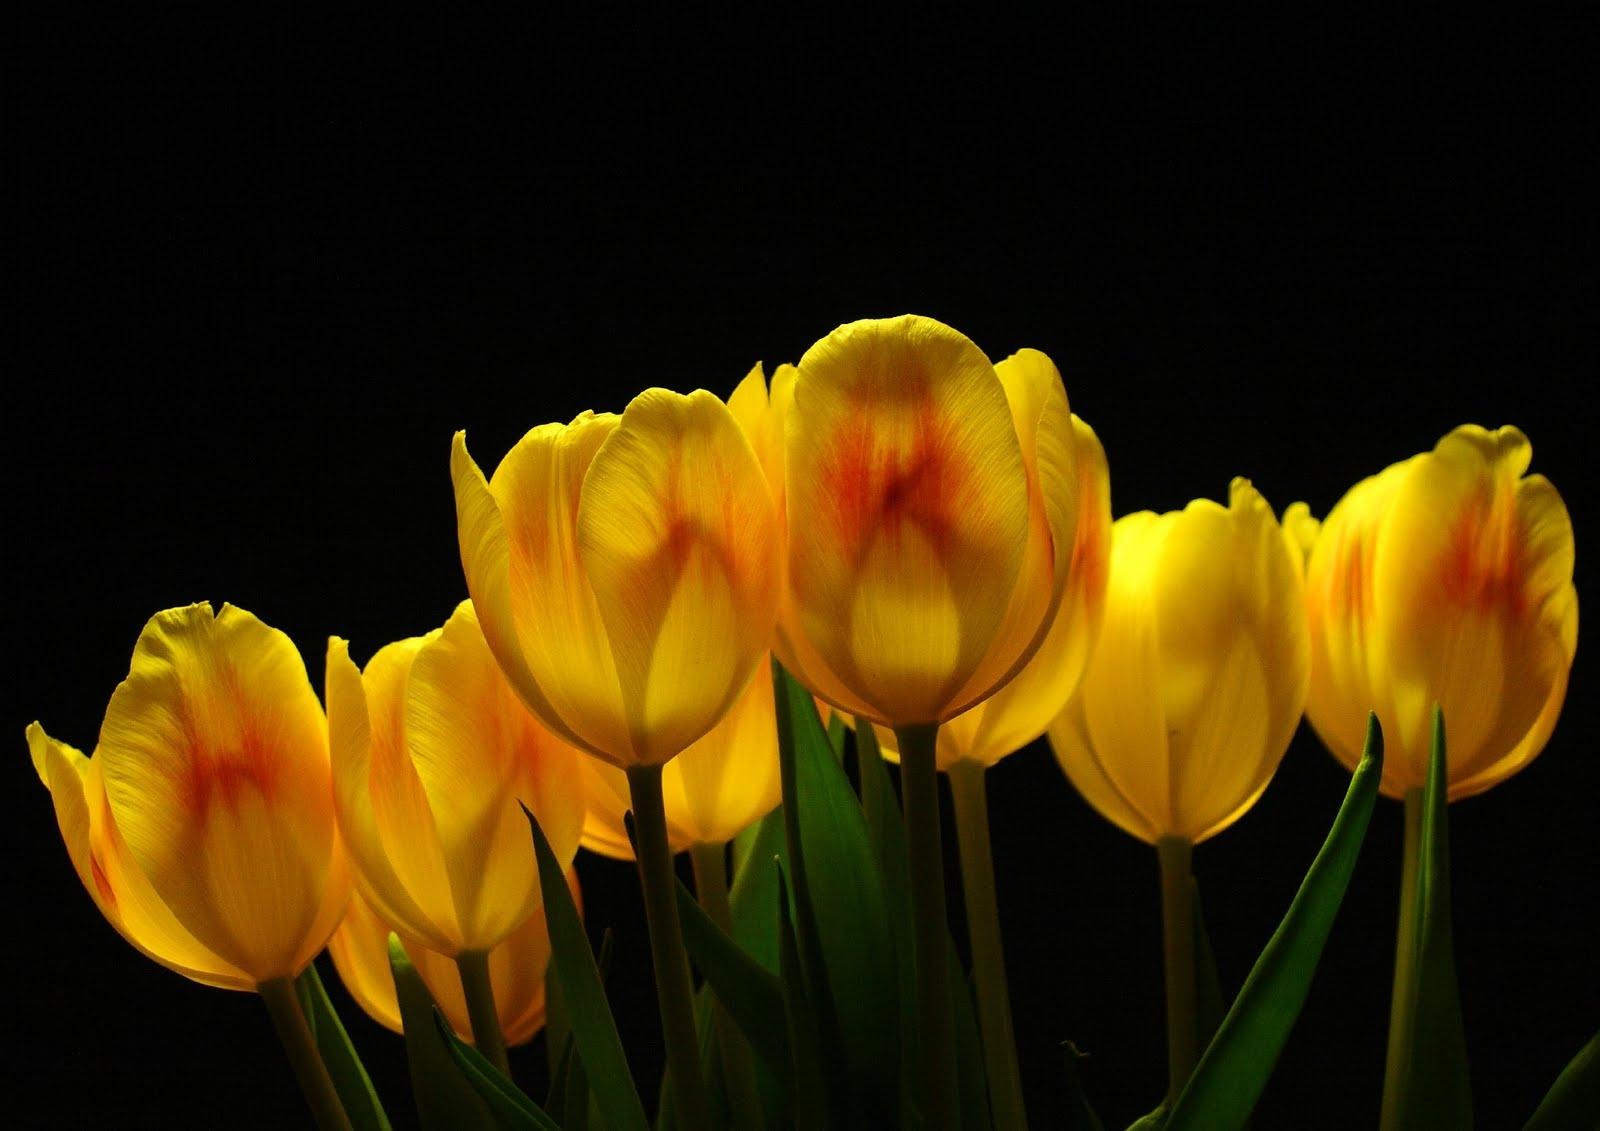 77201 descargar fondo de pantalla Flores, Fondo, Brillar, Luz, Tulipanes: protectores de pantalla e imágenes gratis